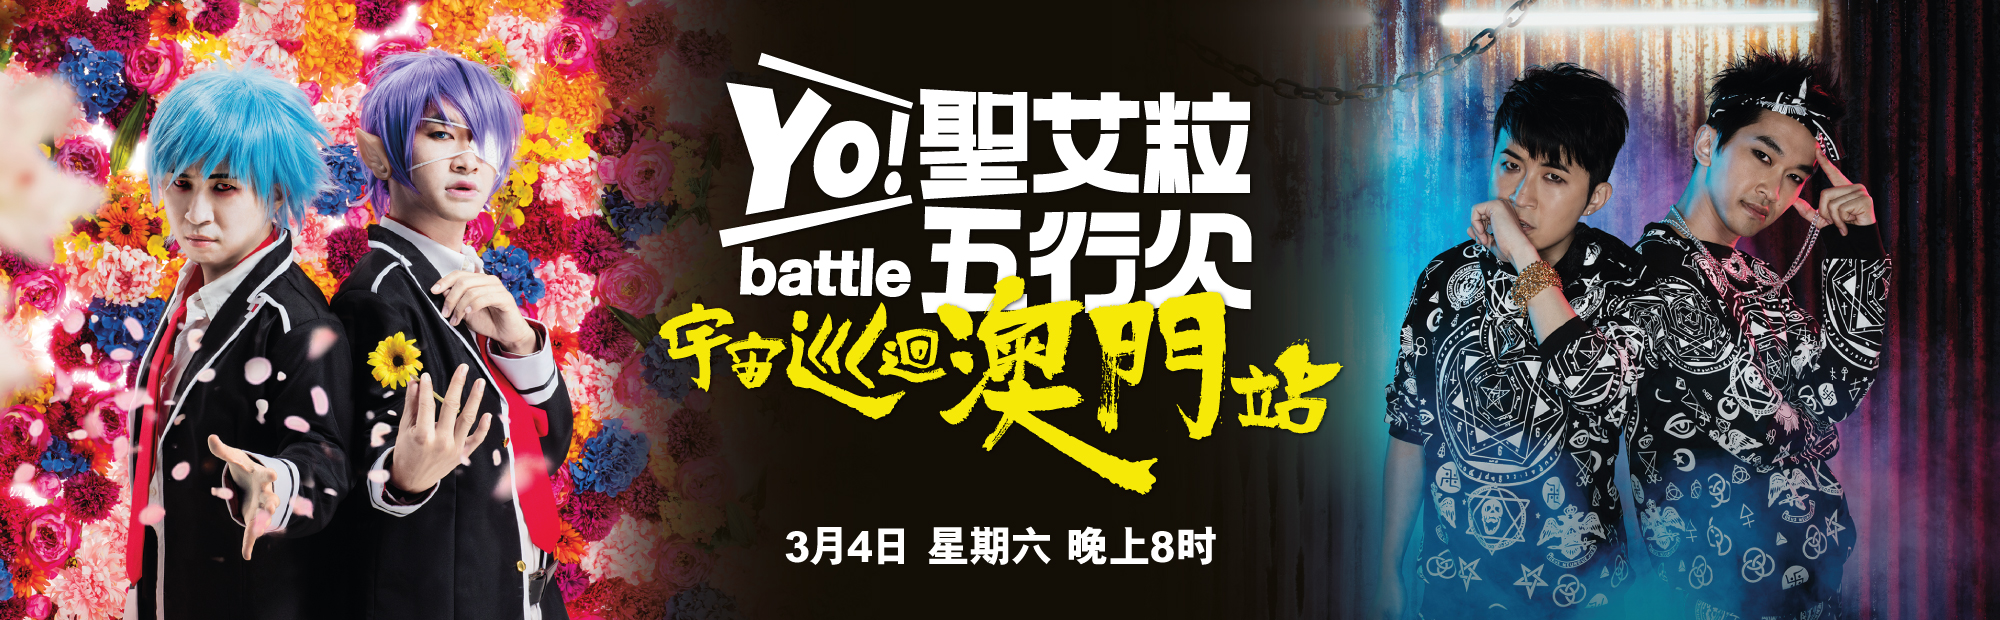 Yo! 圣艾粒 battle 澳门站